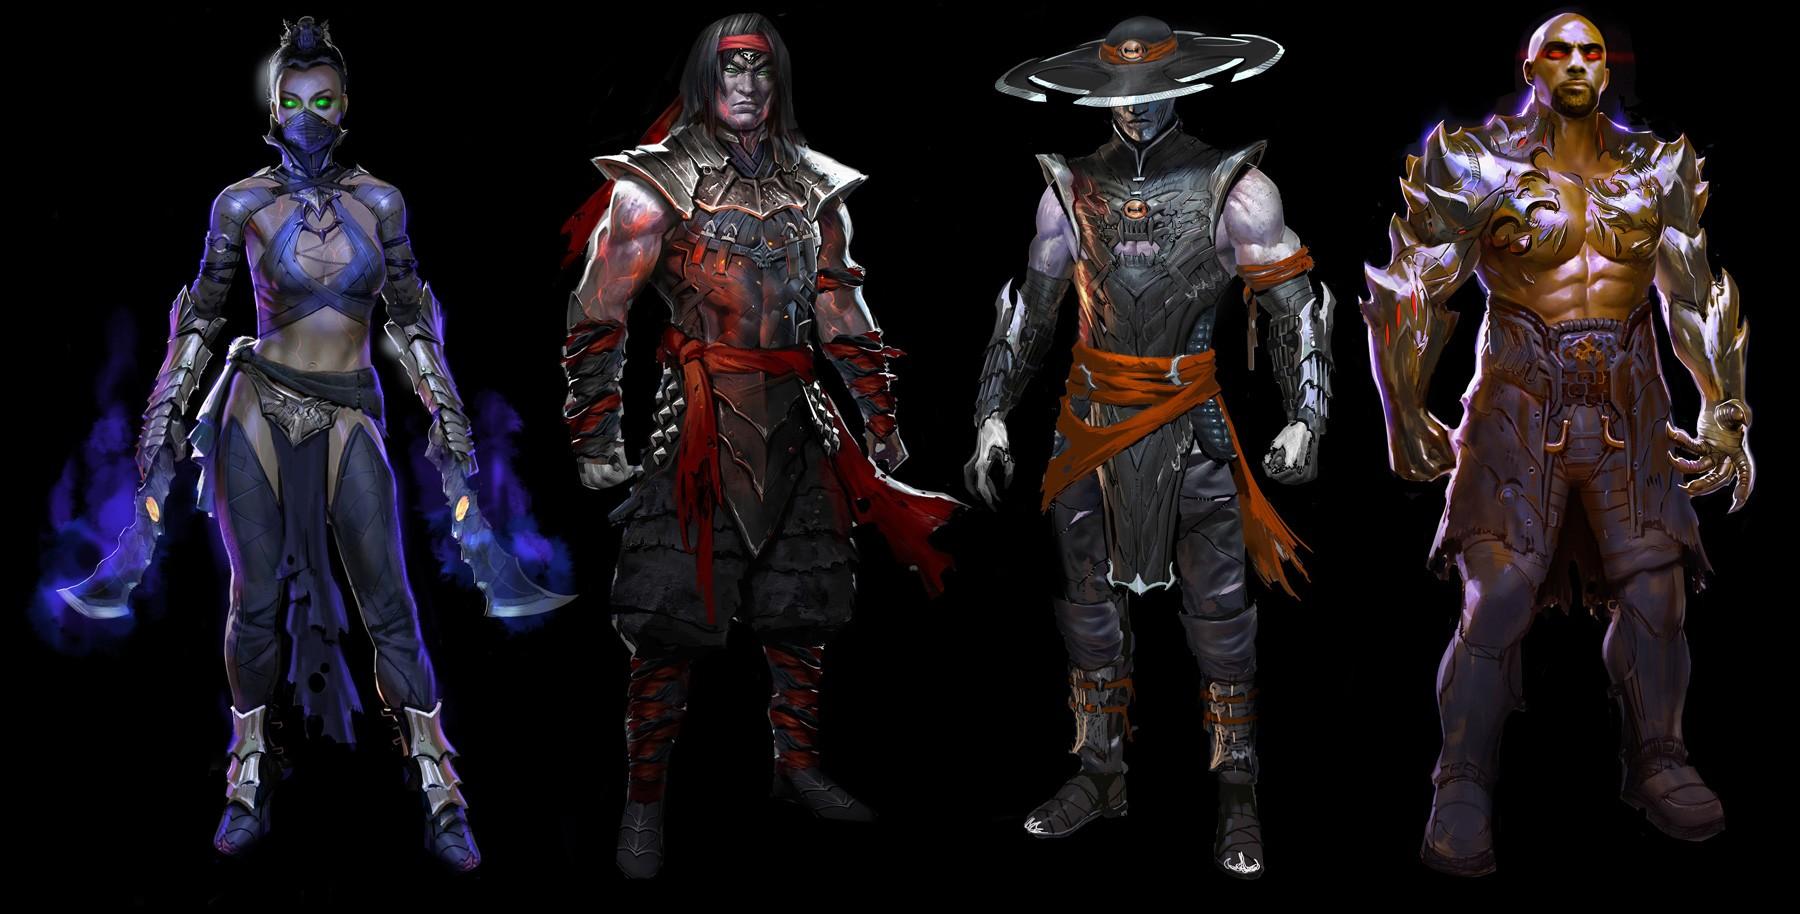 Digital Art Video Games Artwork Concept Toy Mortal Kombat X Jax Kung Lao Liu Kang